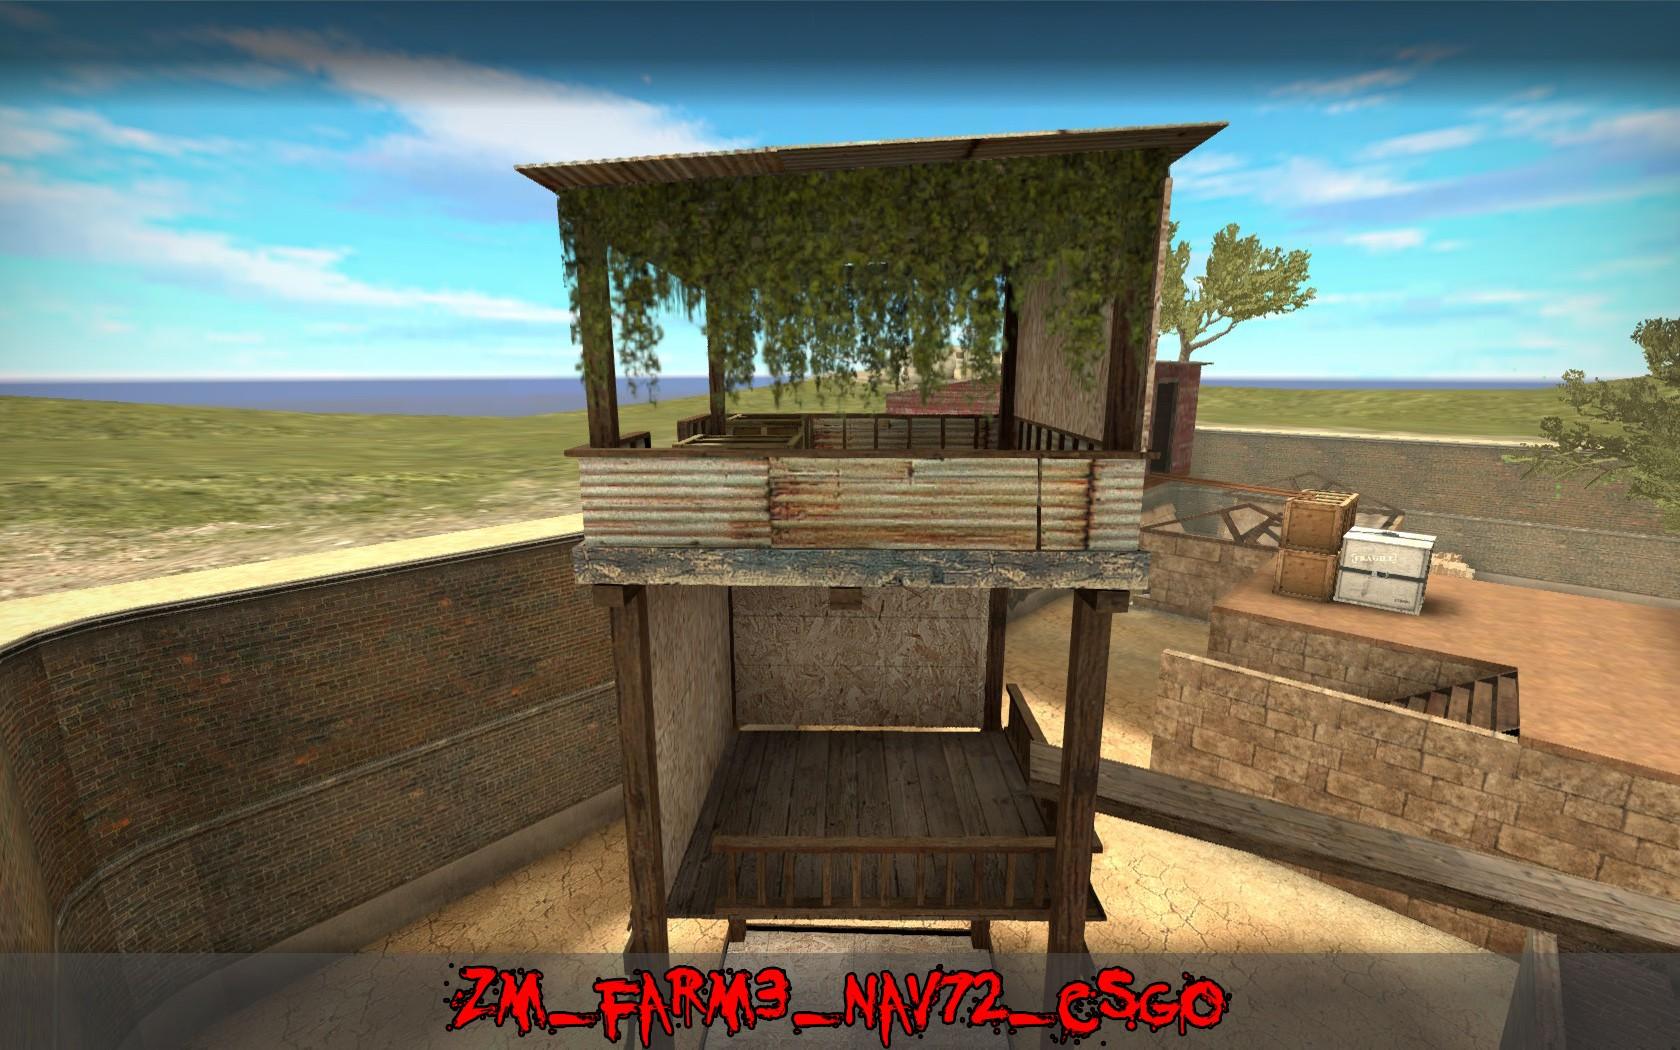 Zm farm3 nav72 csgo opskins в рублях